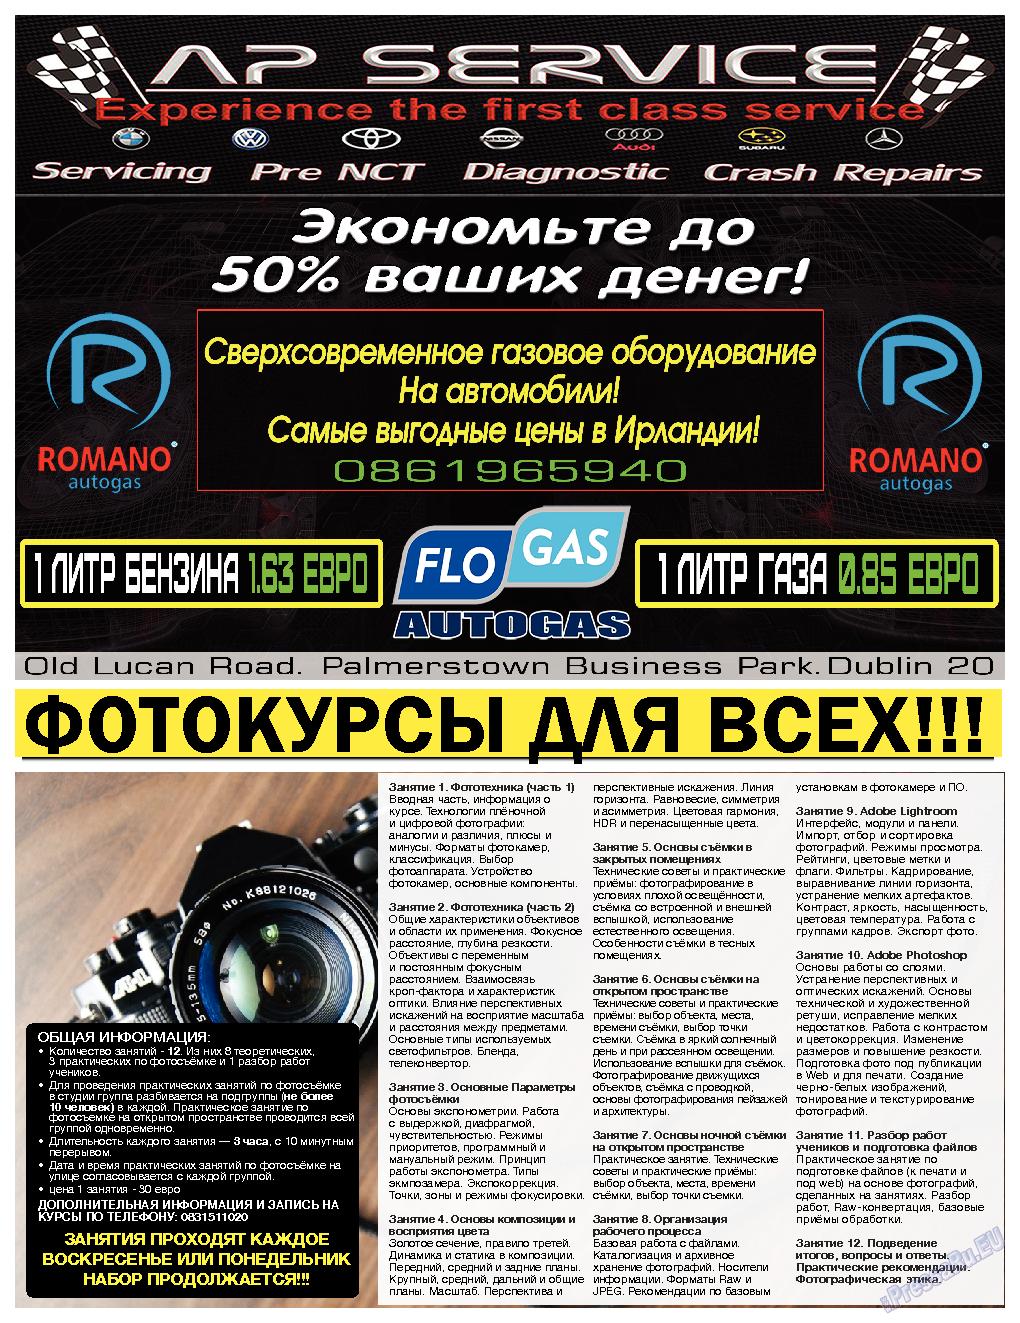 Дублин инфоцентр (газета). 2013 год, номер 21, стр. 11